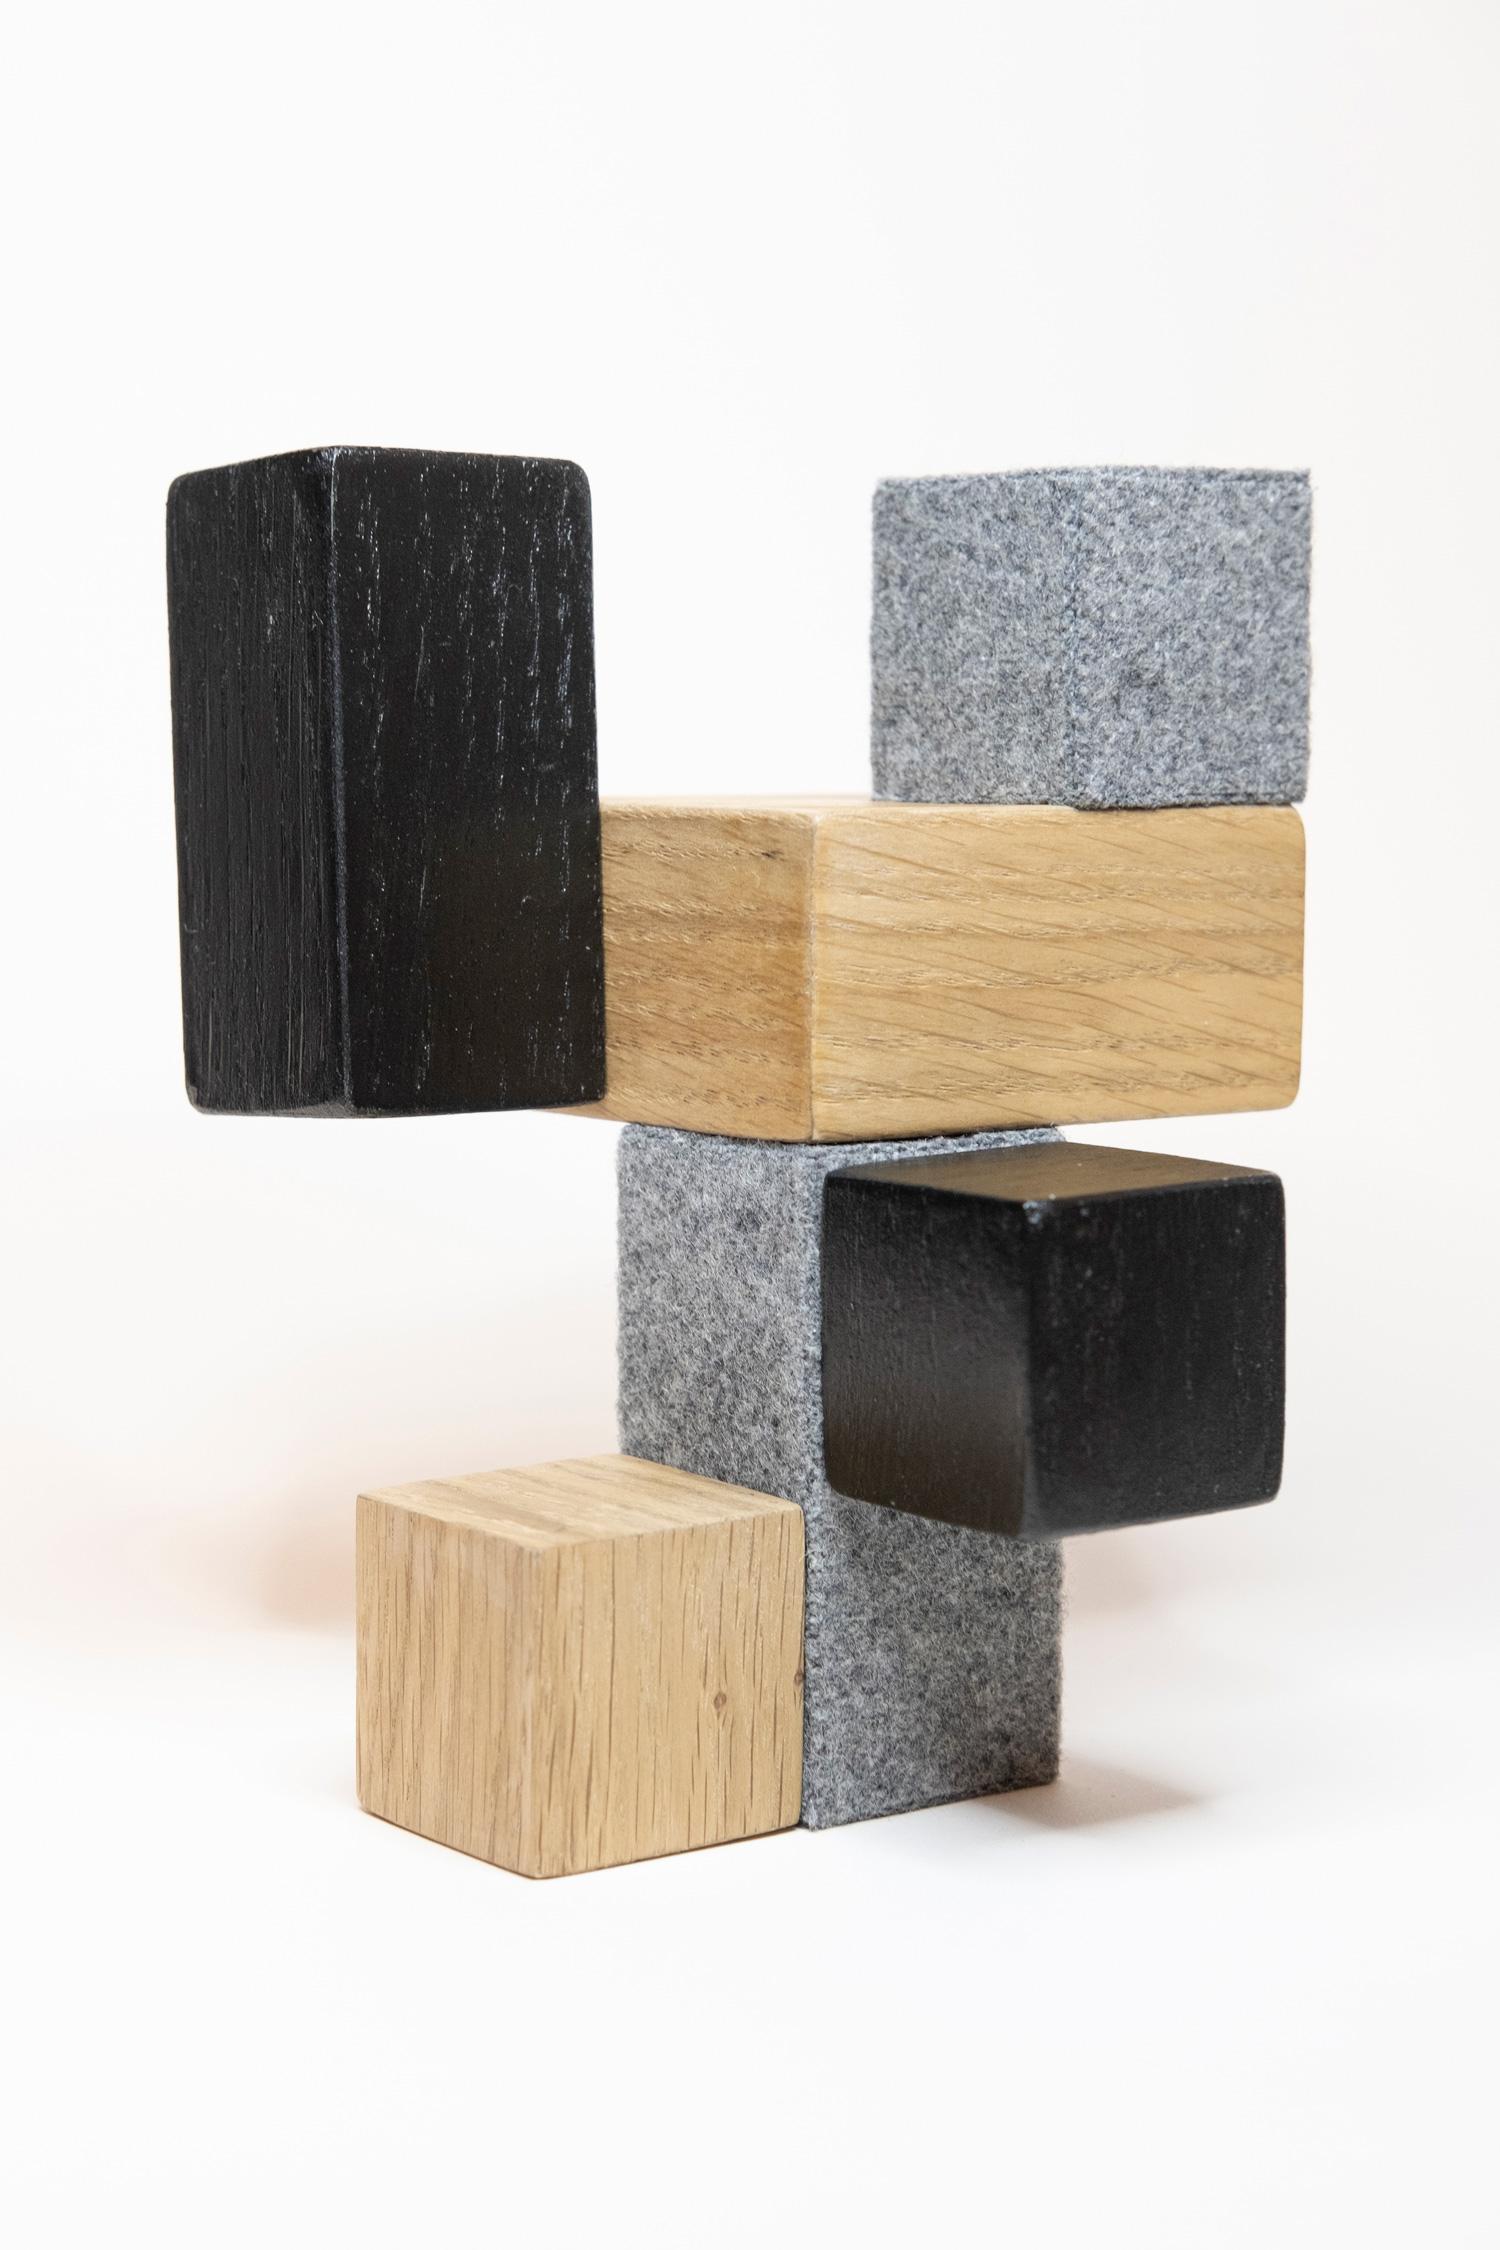 Buld product image